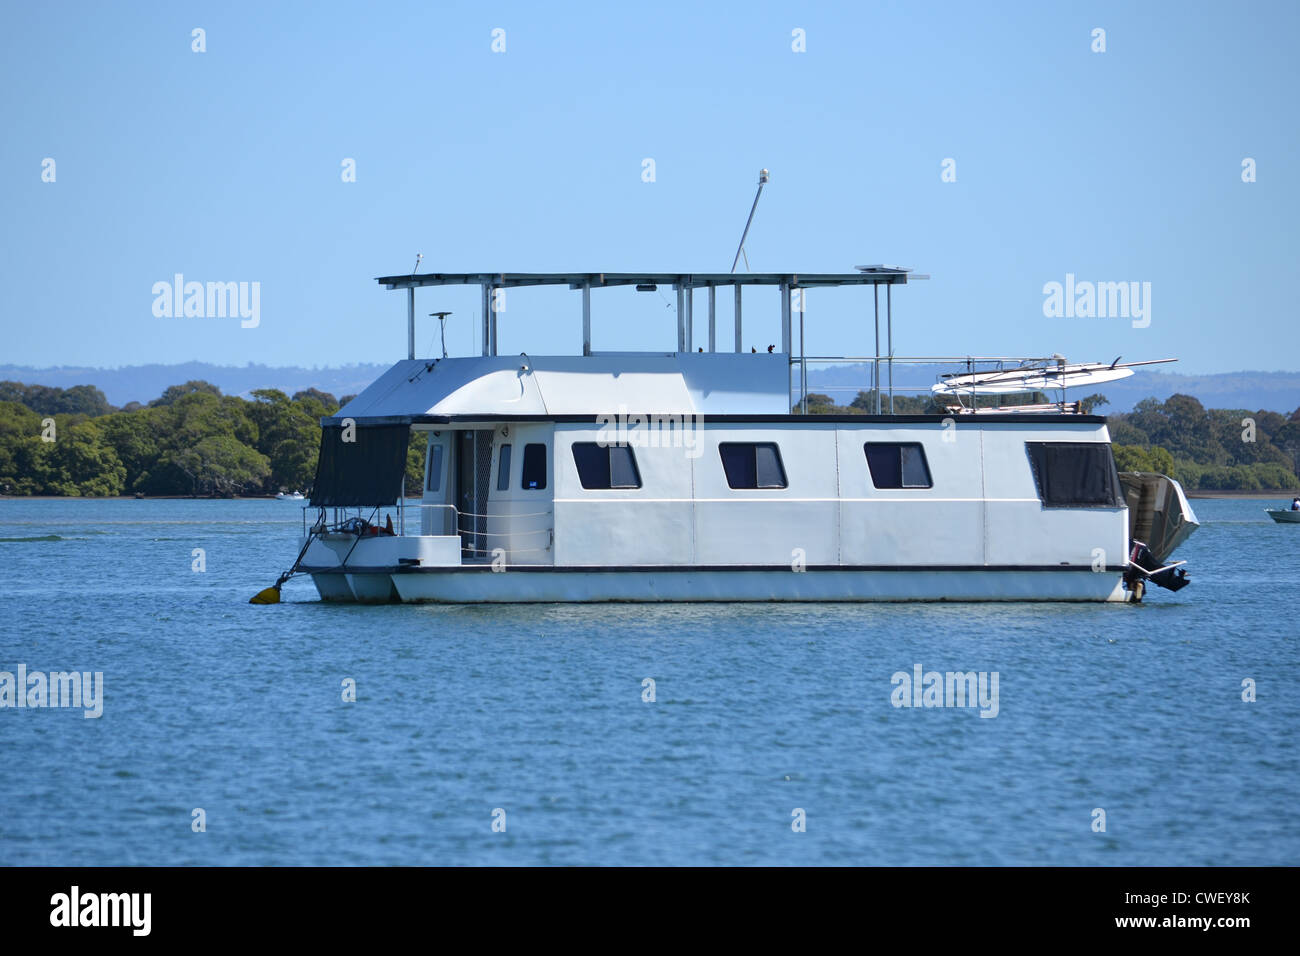 Houseboat anchored off Bribie Island, Queensland, Australia - Stock Image